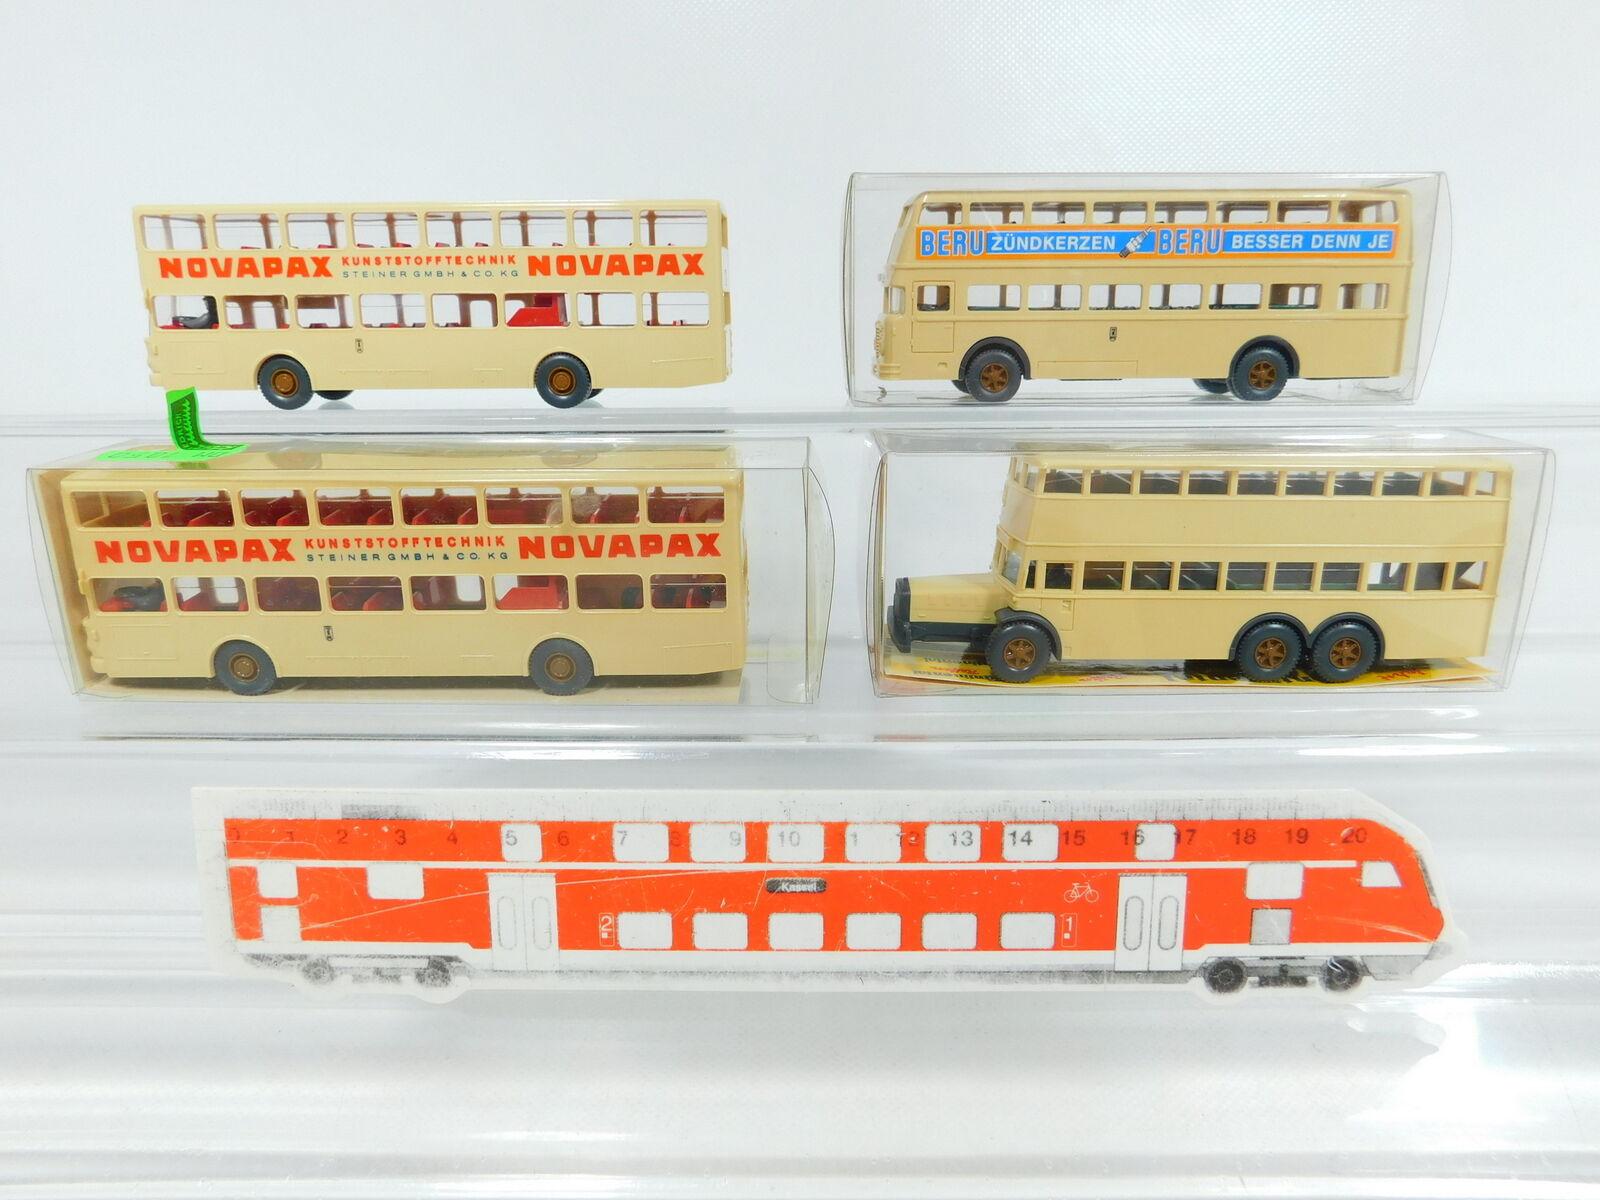 BV956-0,5 x Wiking H0   1 87 Bus  730 Man +873 Berlin Bus + 720 1,Mint + 3x